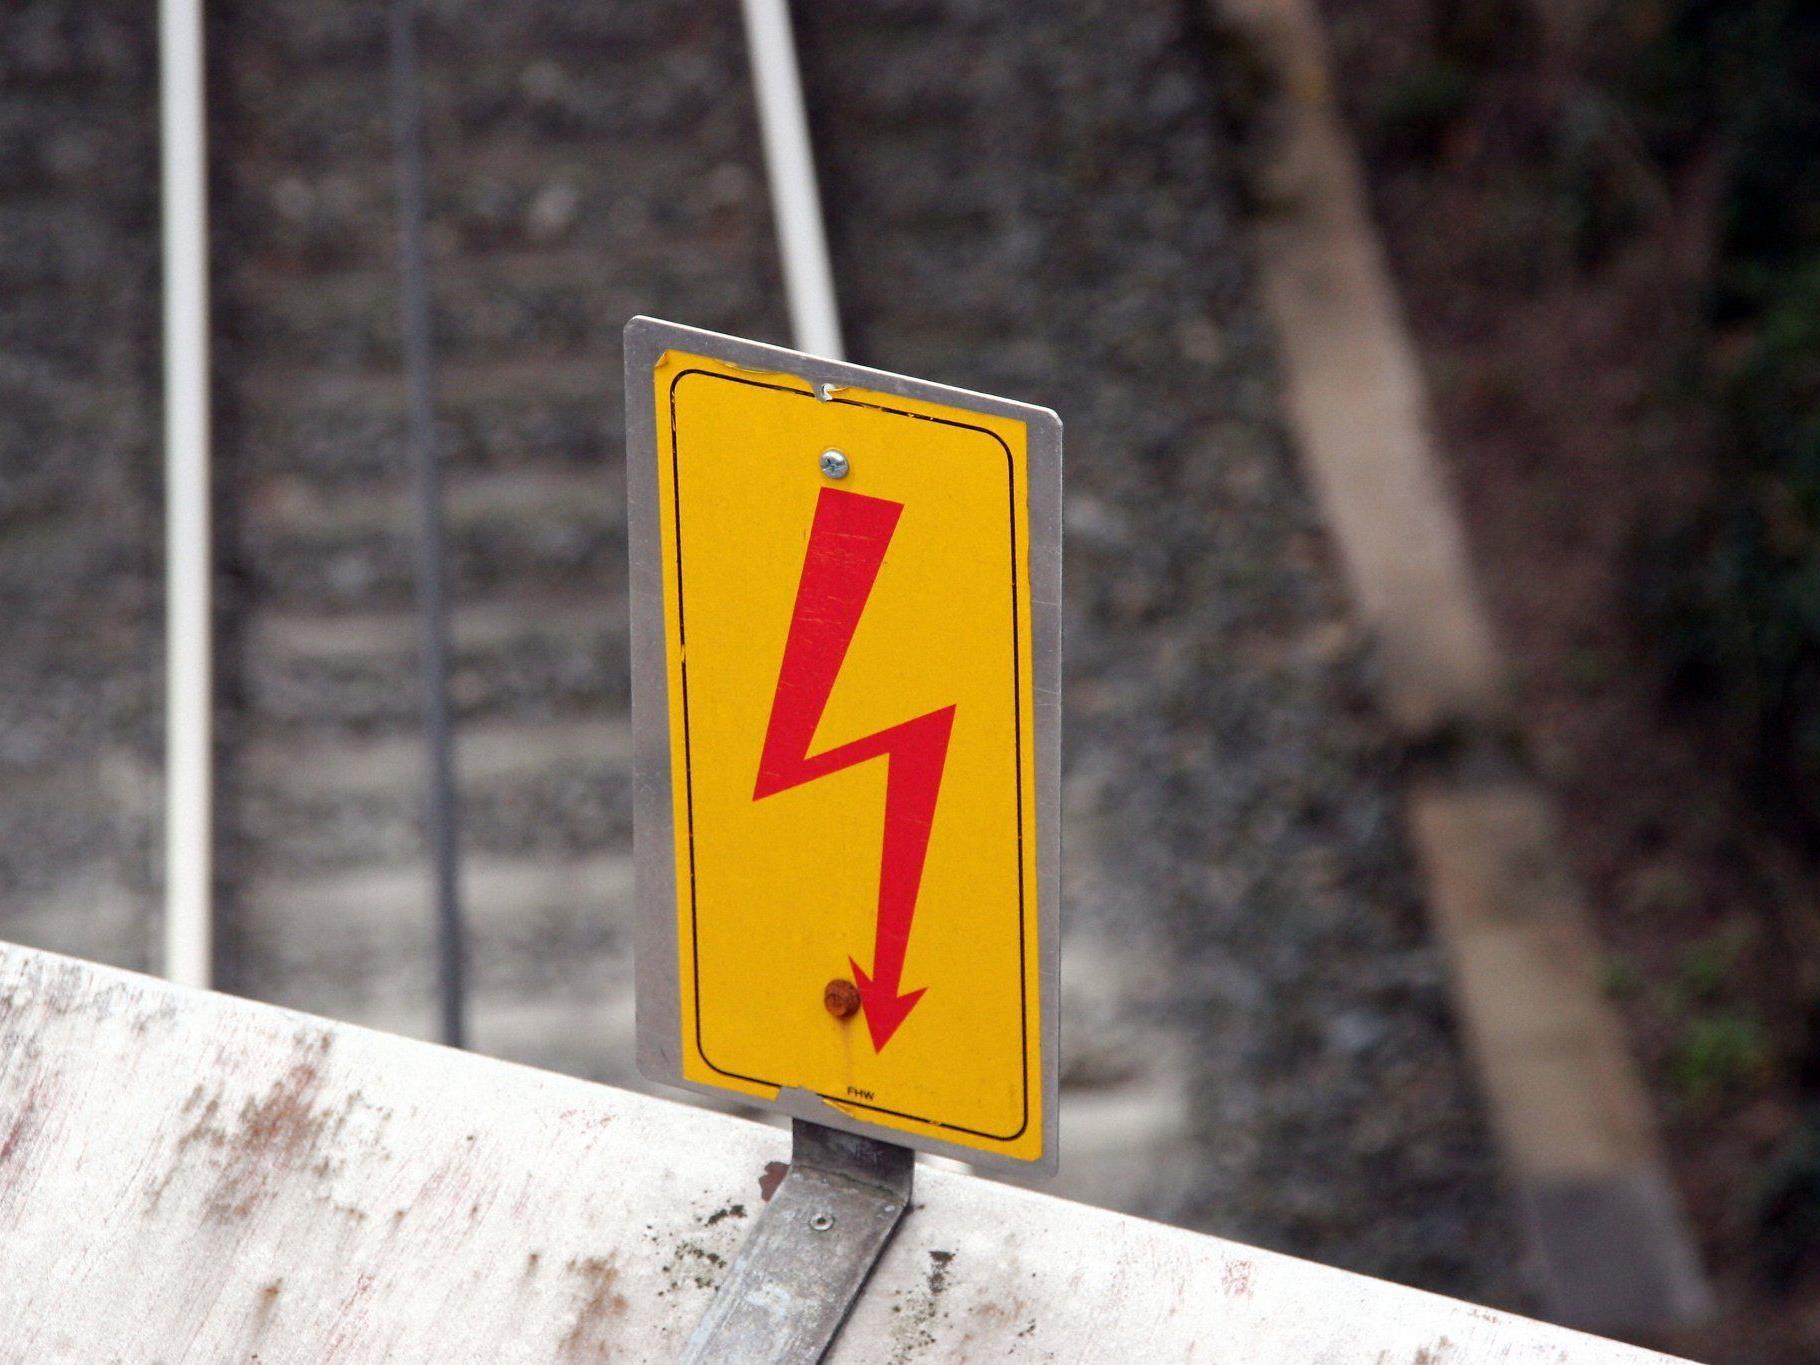 24-Jähriger starb nach Stromunfall